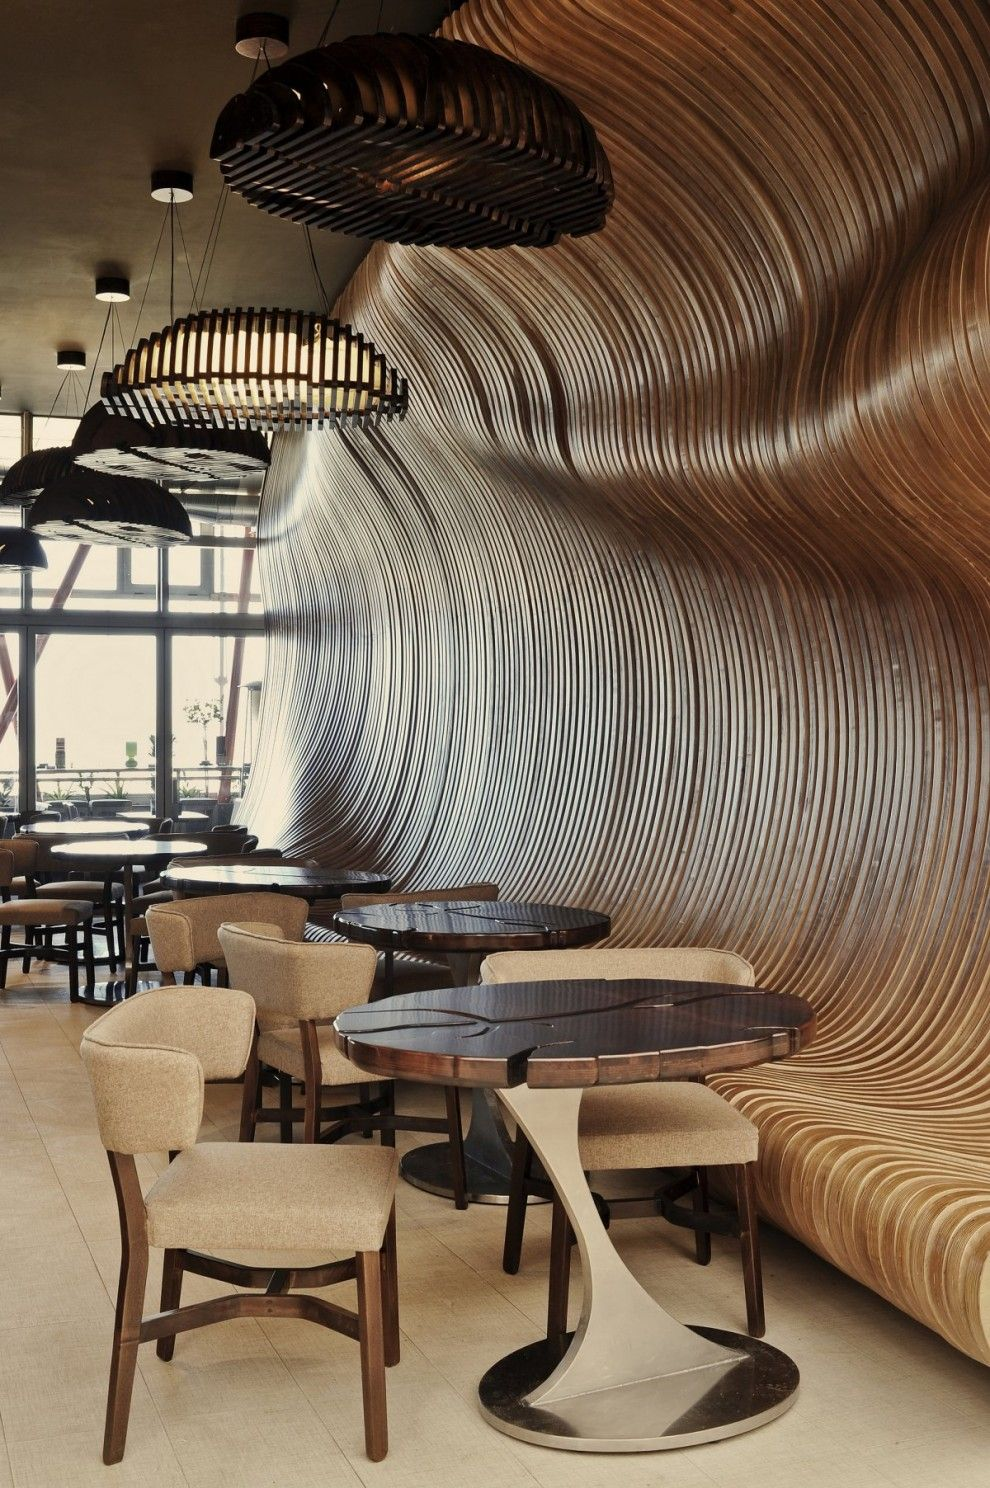 don café house / innarch | restaurant / bar | design, interieur